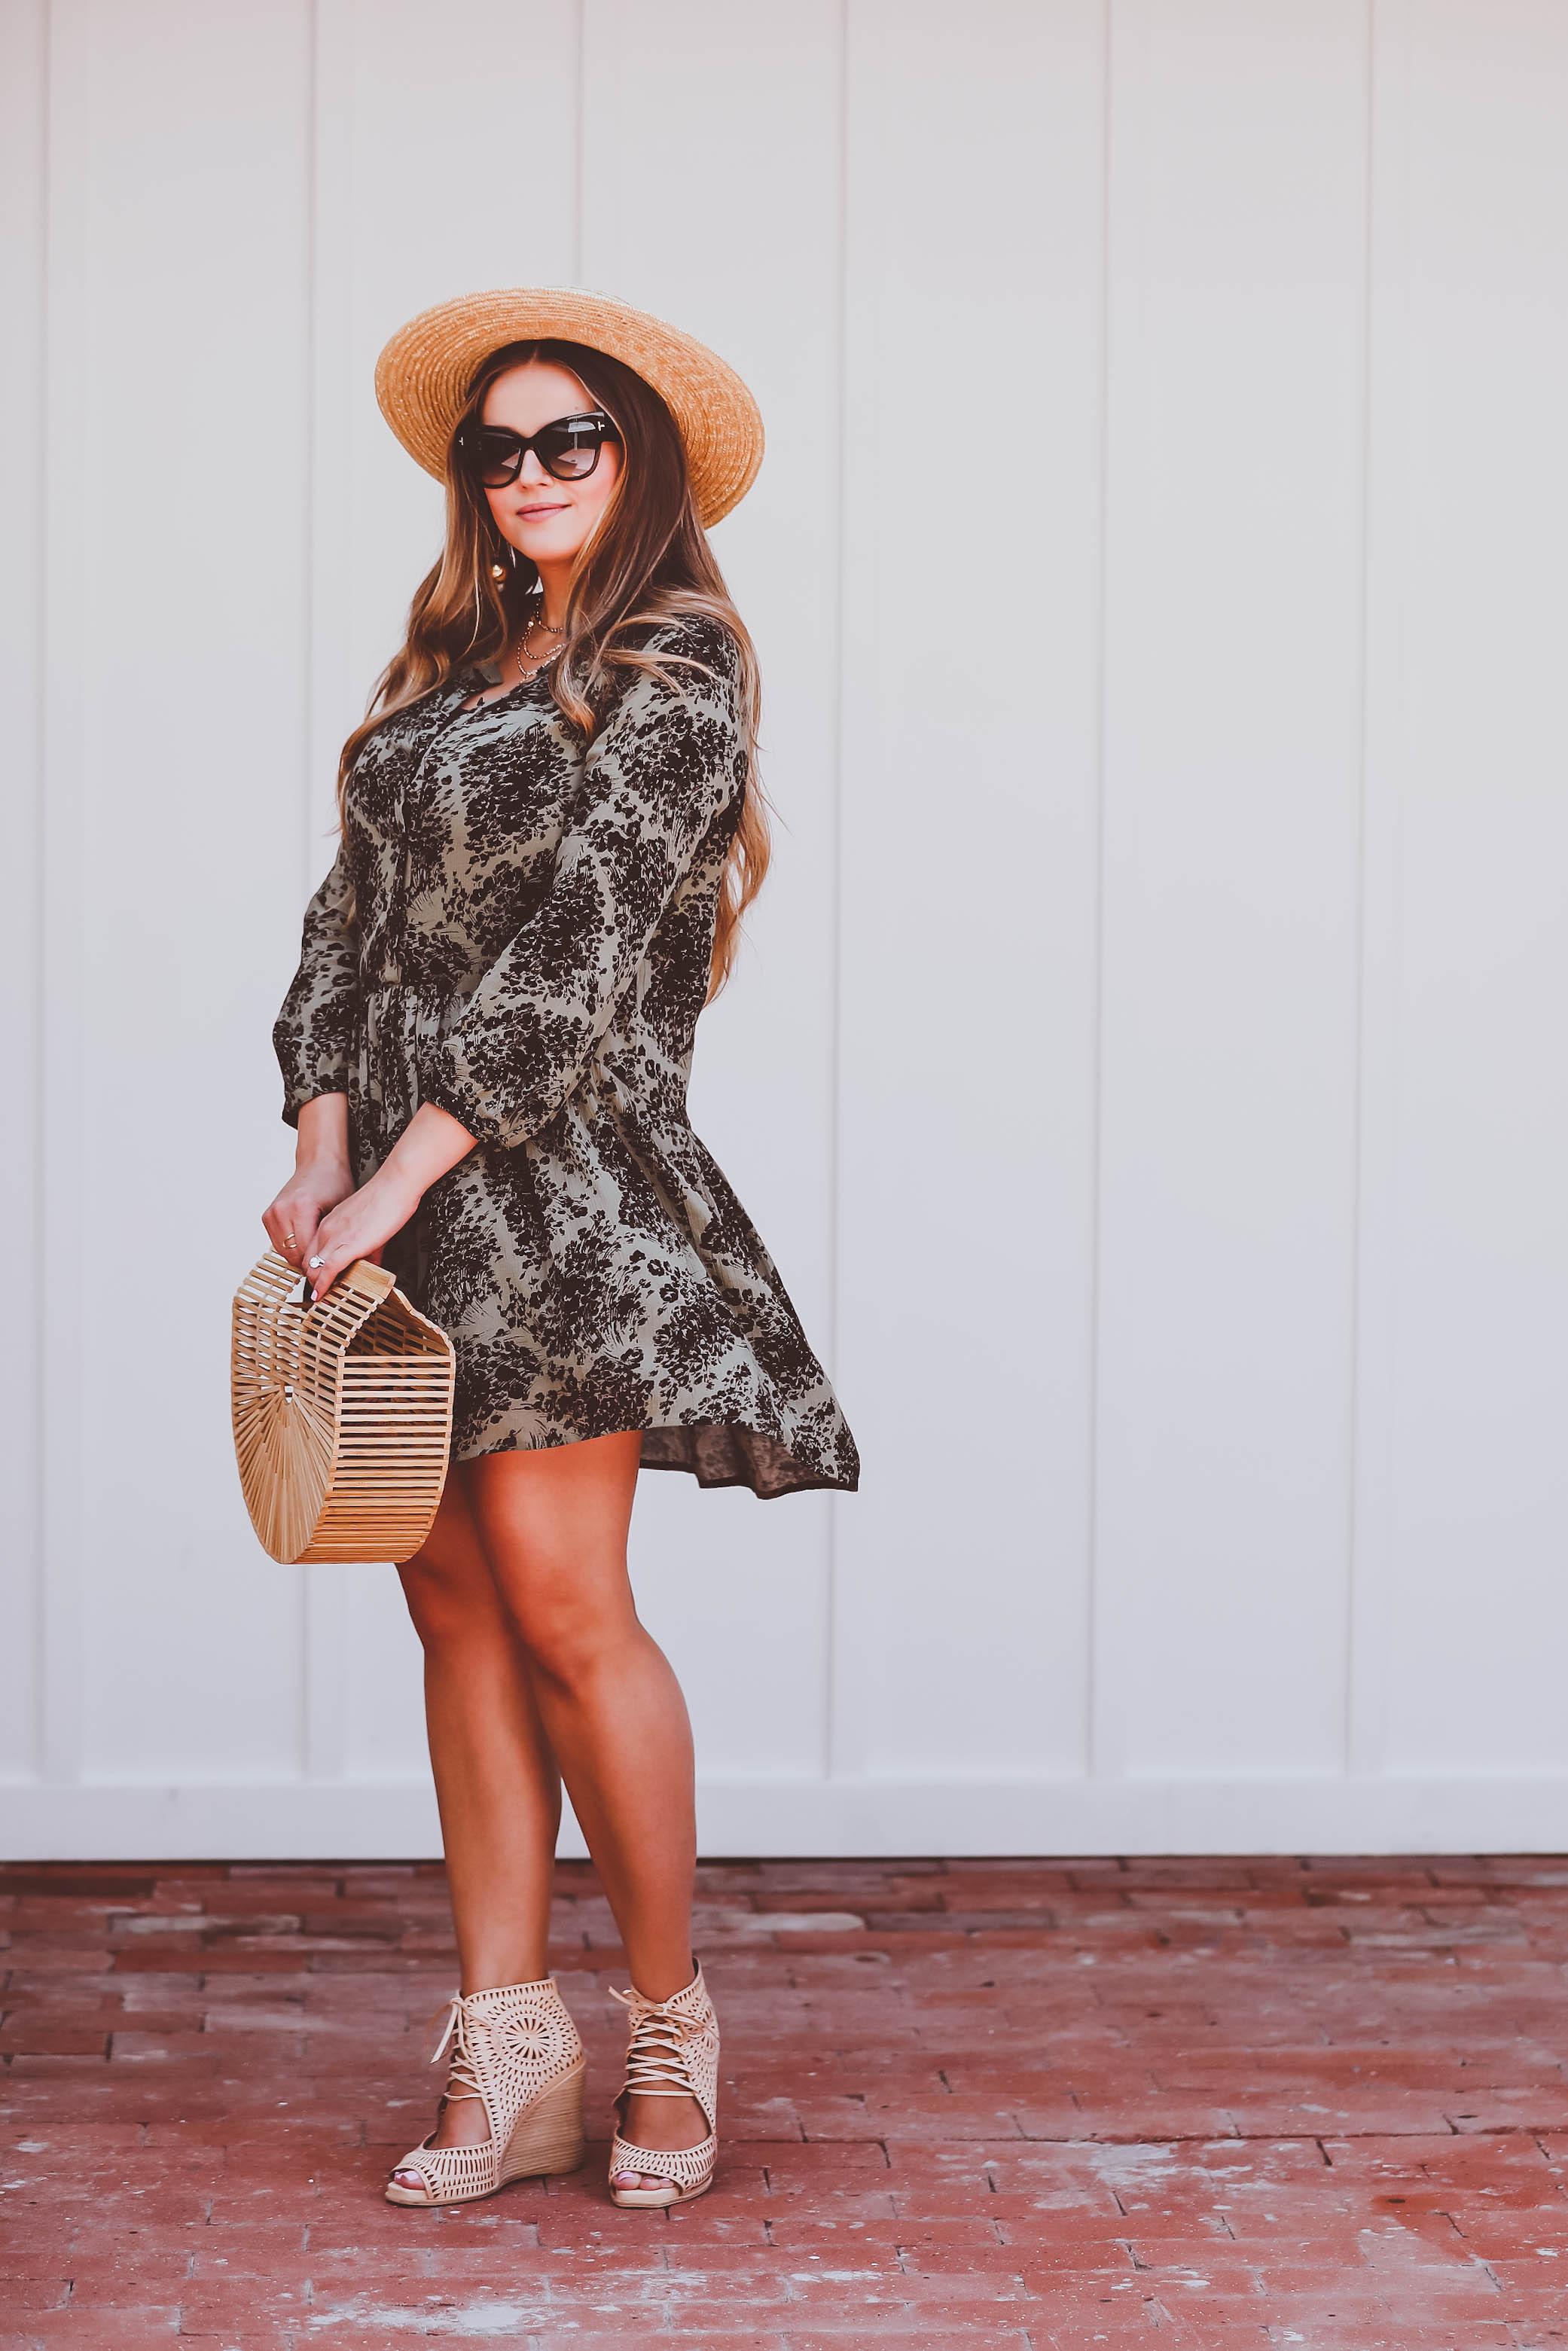 #OOTD // Olive Green & Black Printed Button Front Dress | BondGirlGlam.com